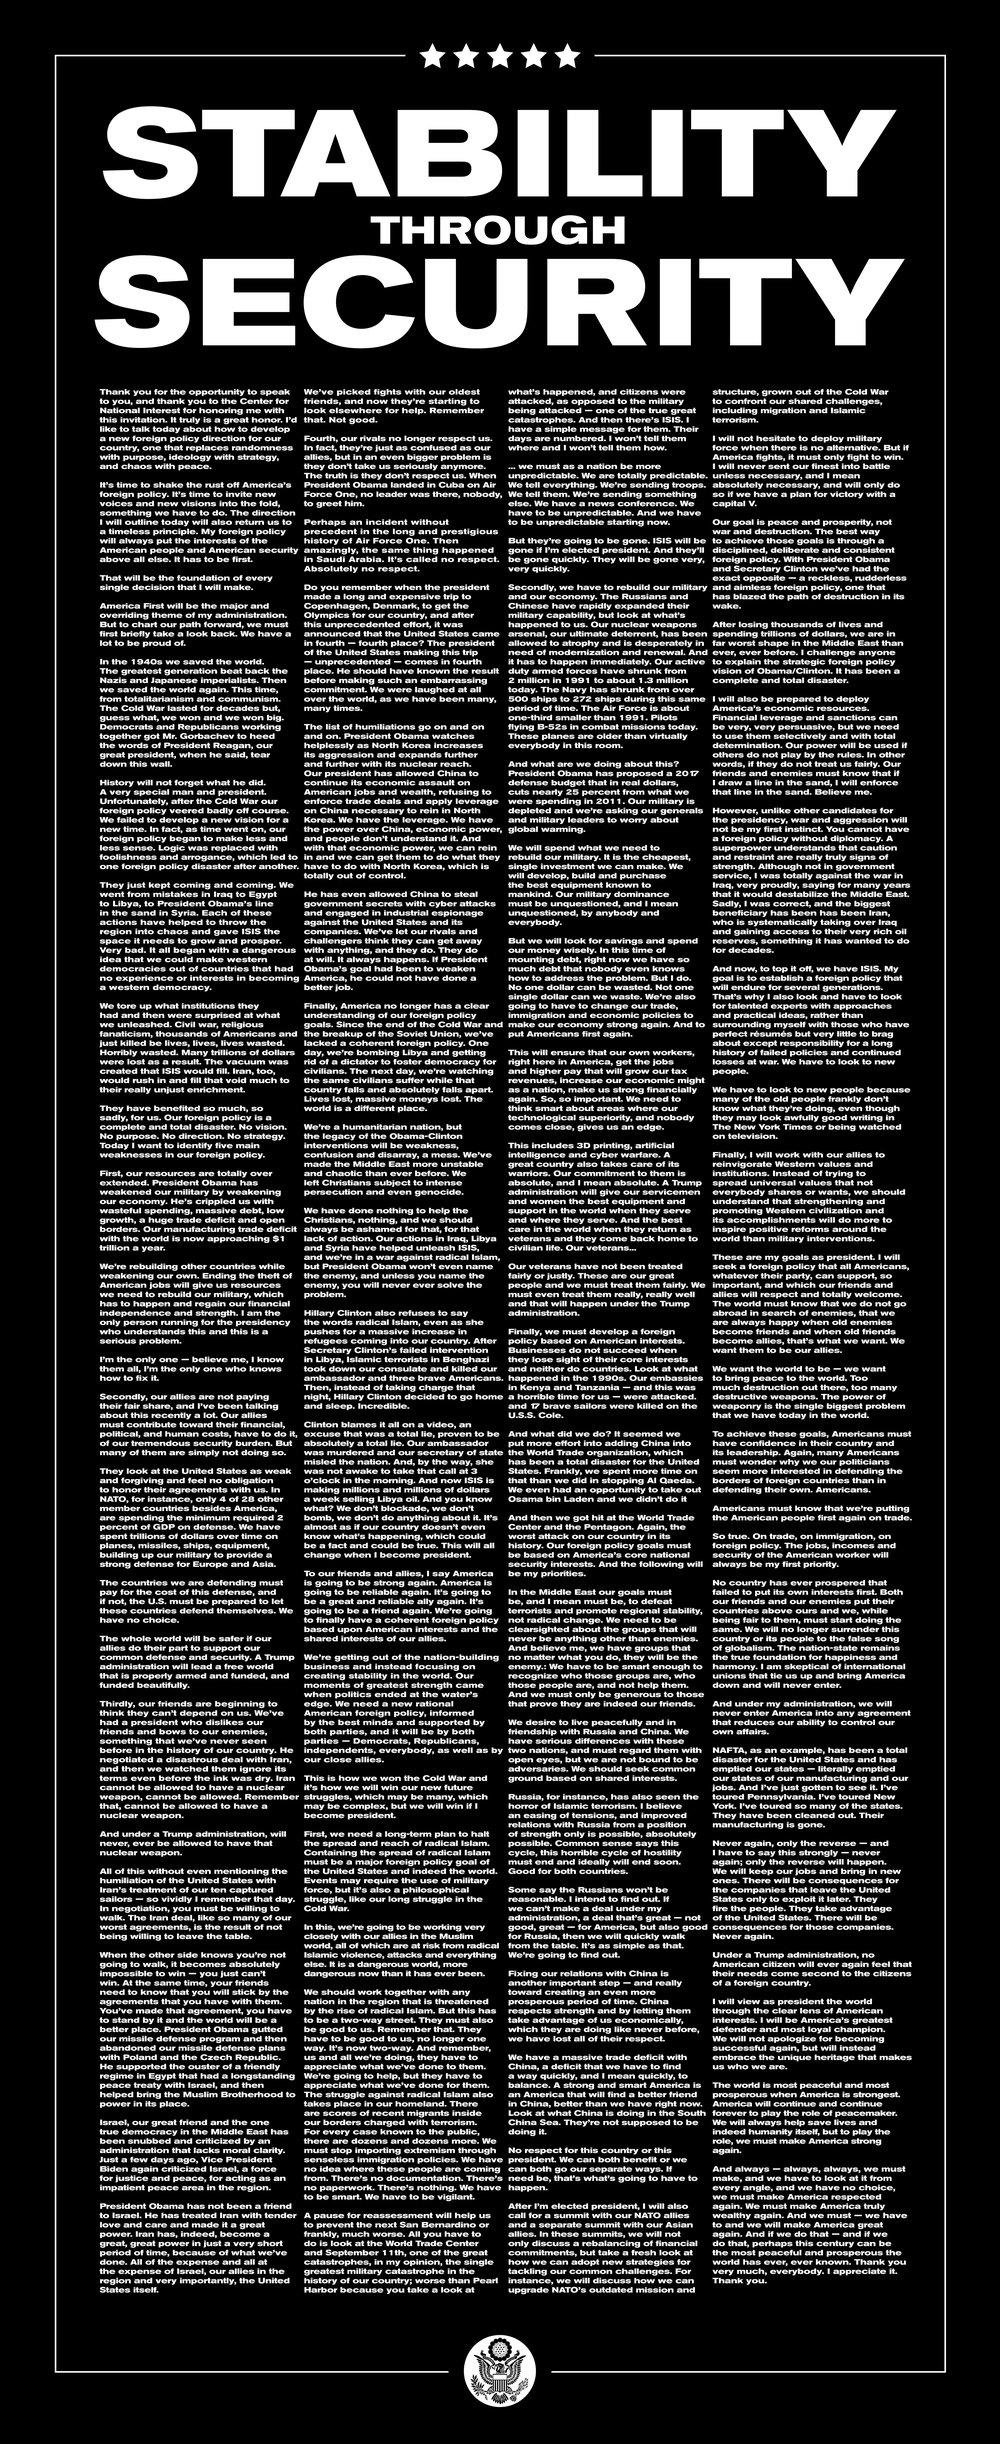 posters_gov_.jpg